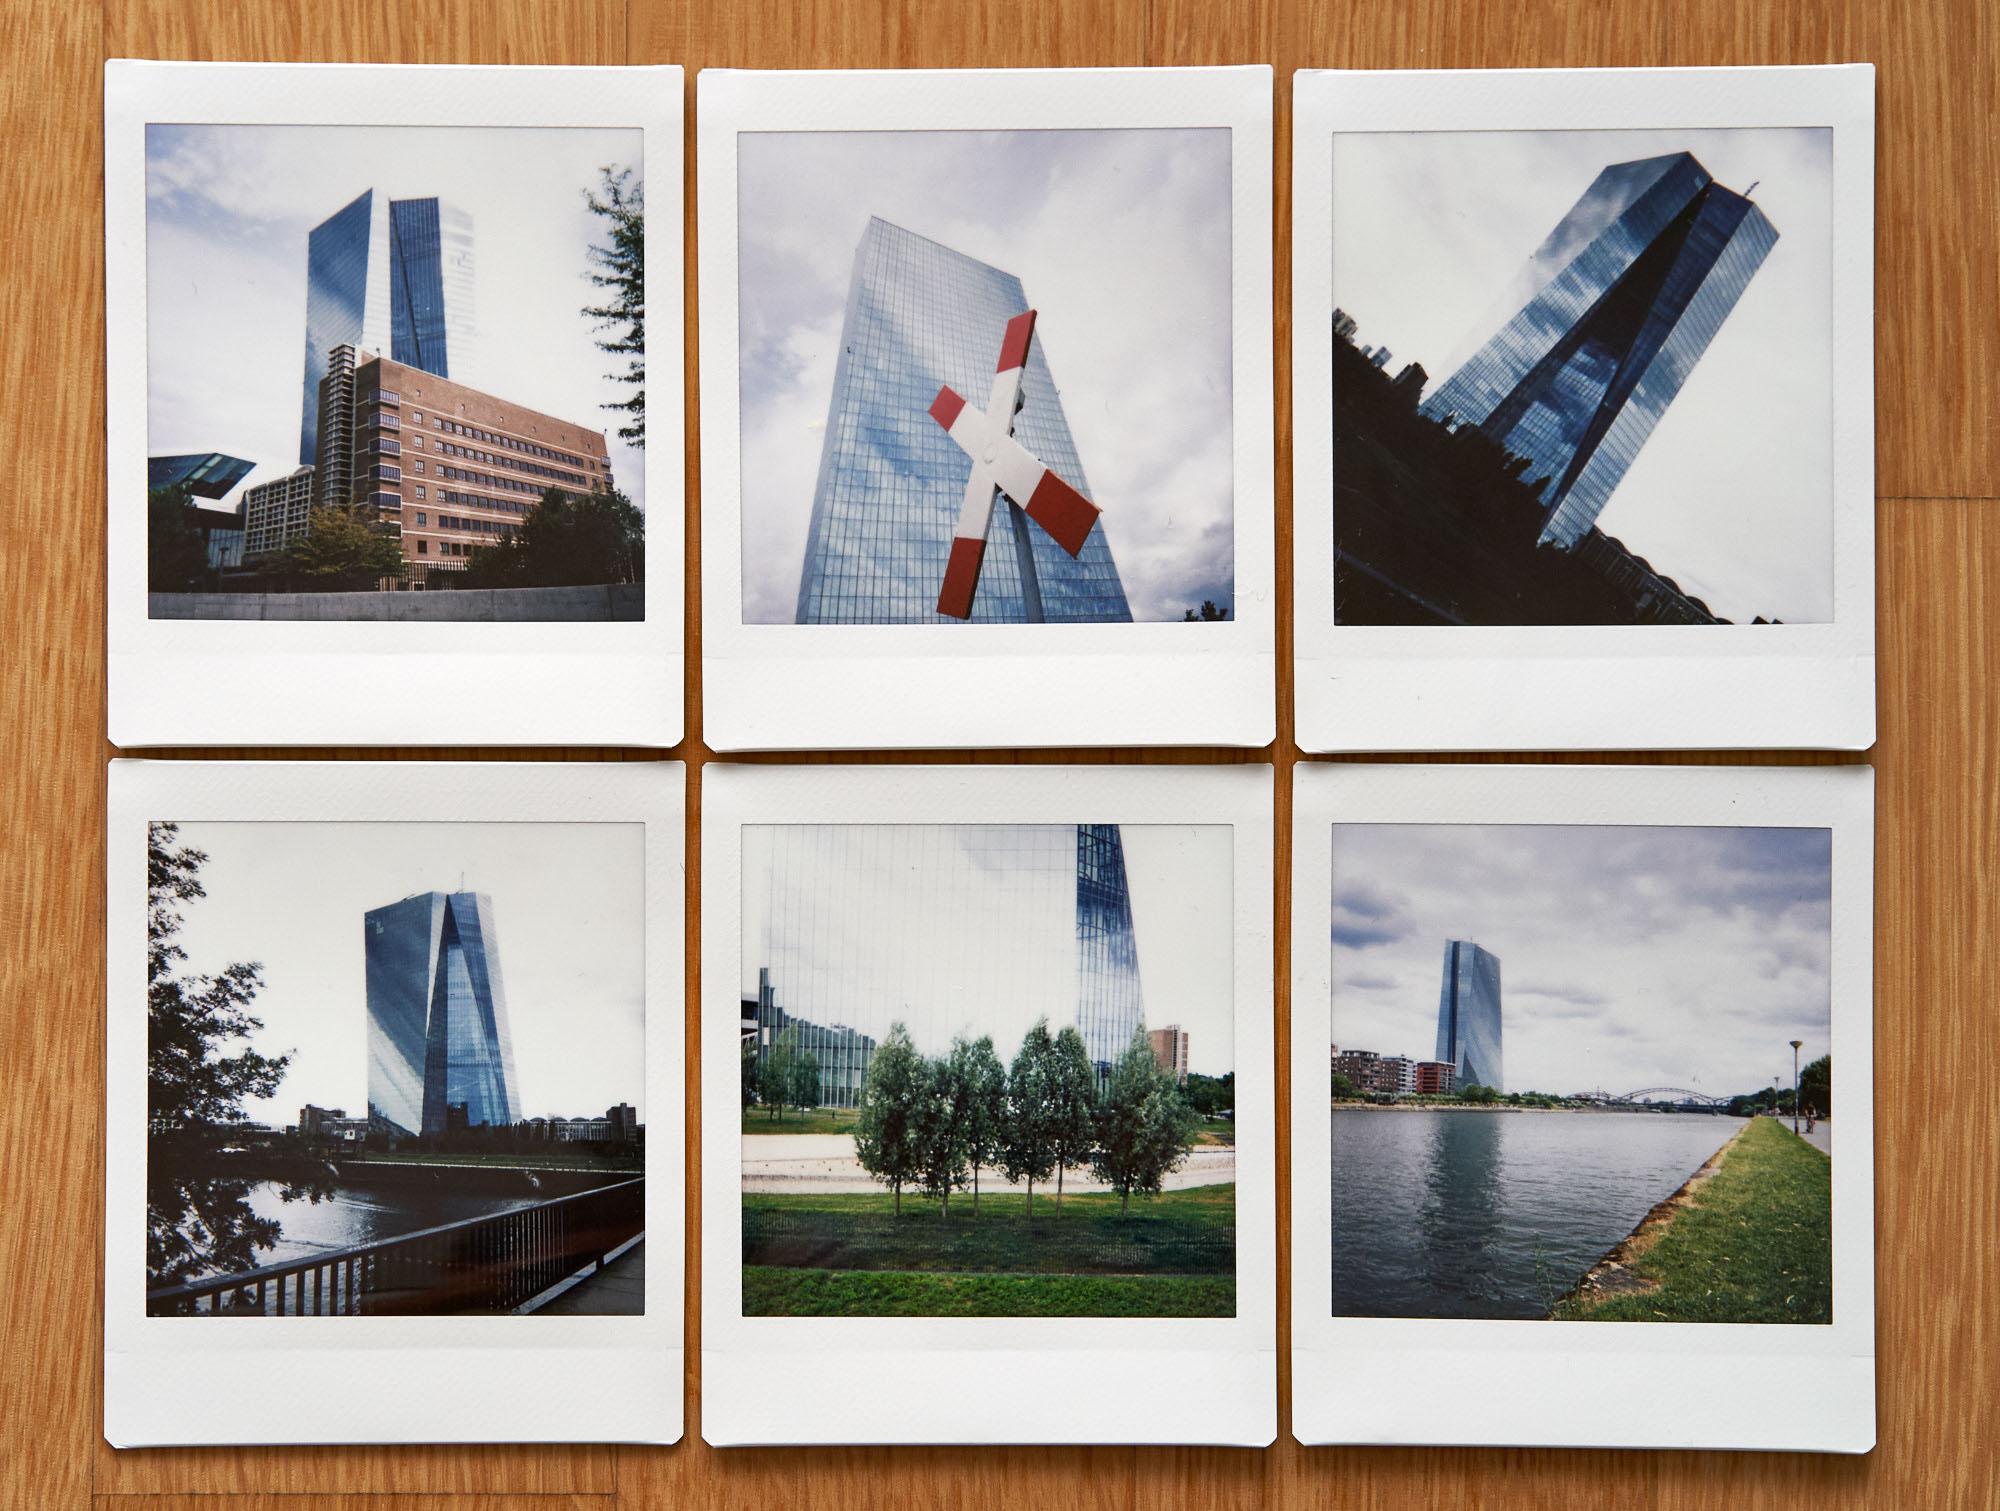 expresskasse / EZB Polaroids